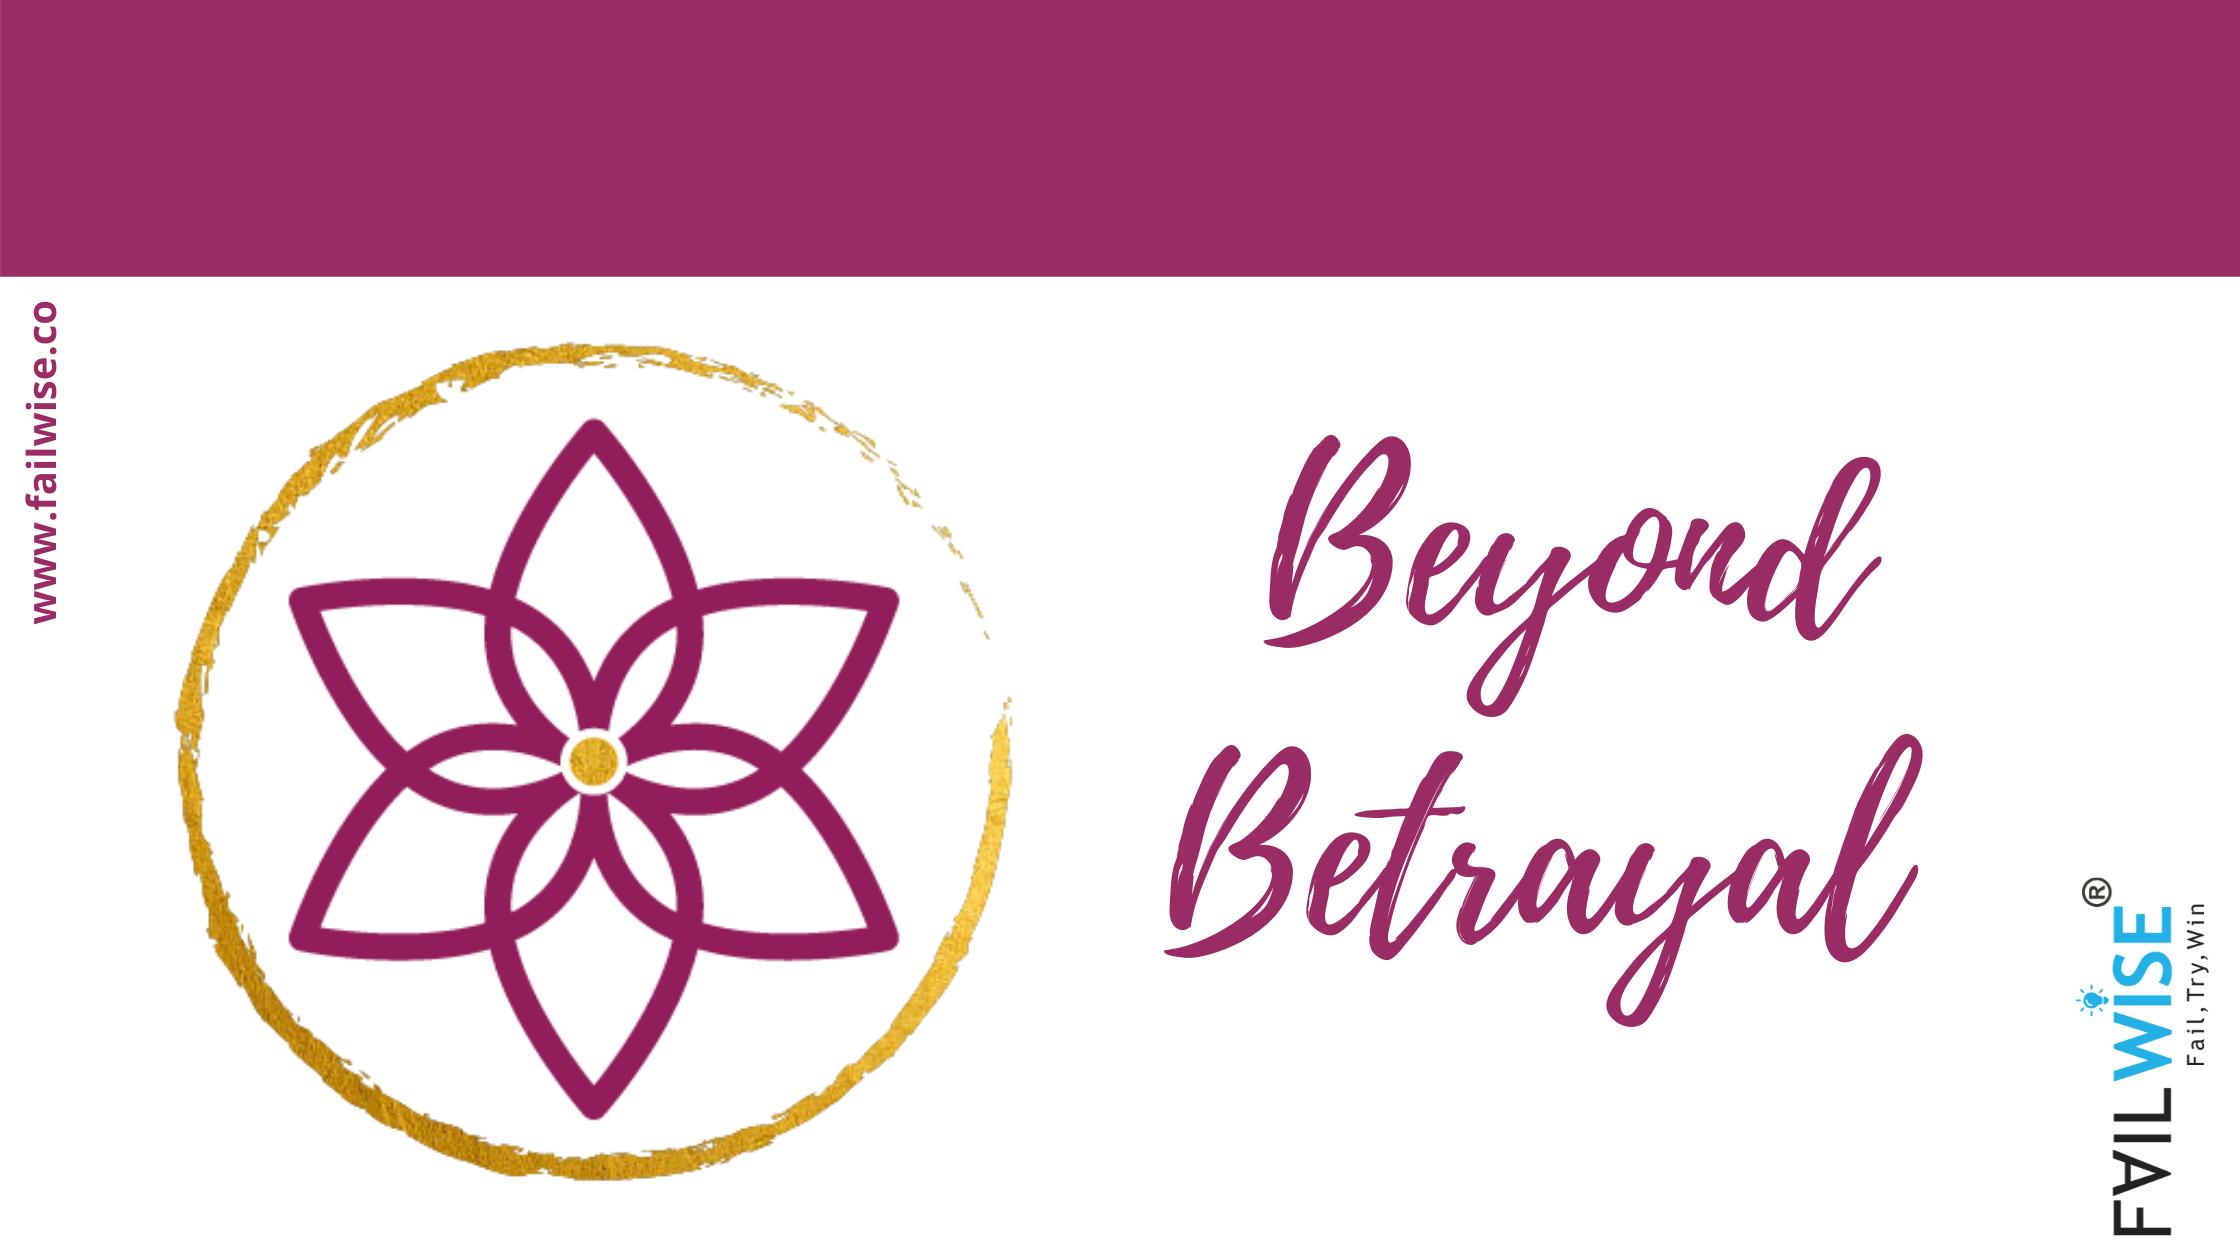 Post Betrayal Transformation | Towards Your Breakthrough